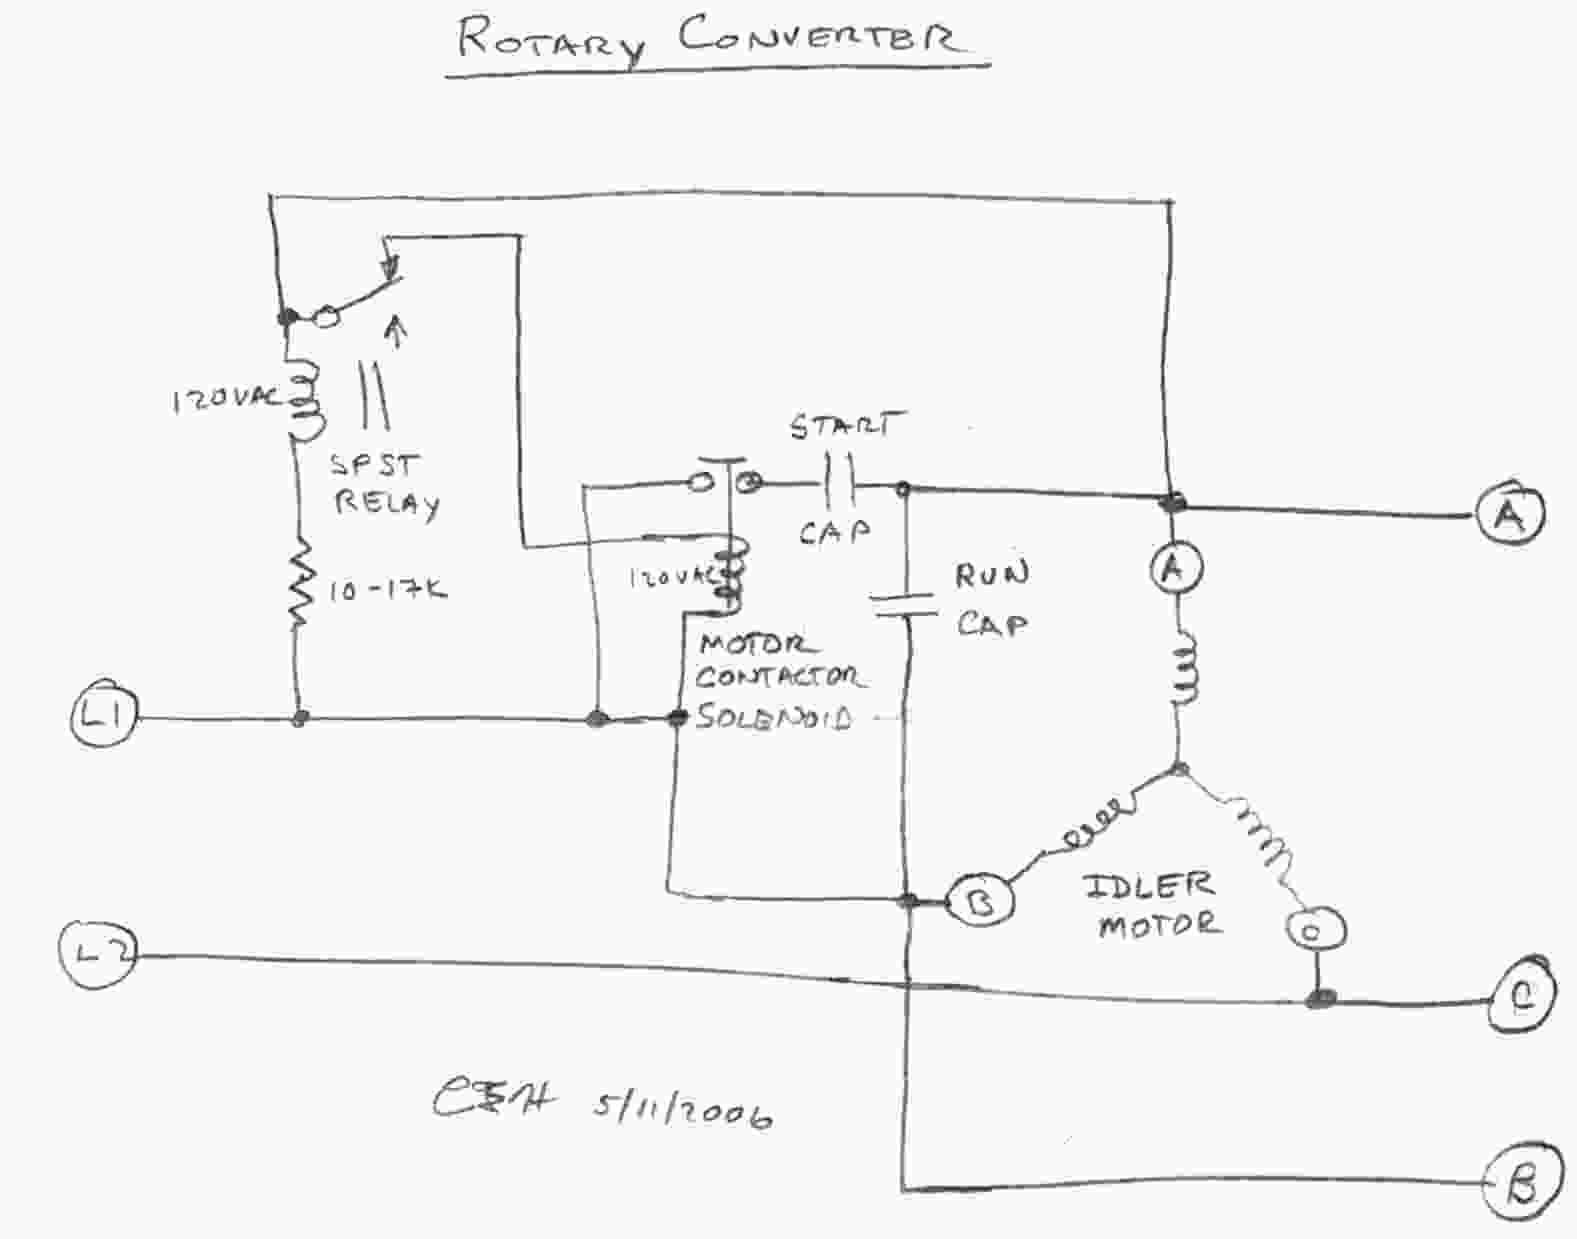 weg 3 phase motor wiring diagram 1997 ford explorer audio dayton dc speed control gallery | sample